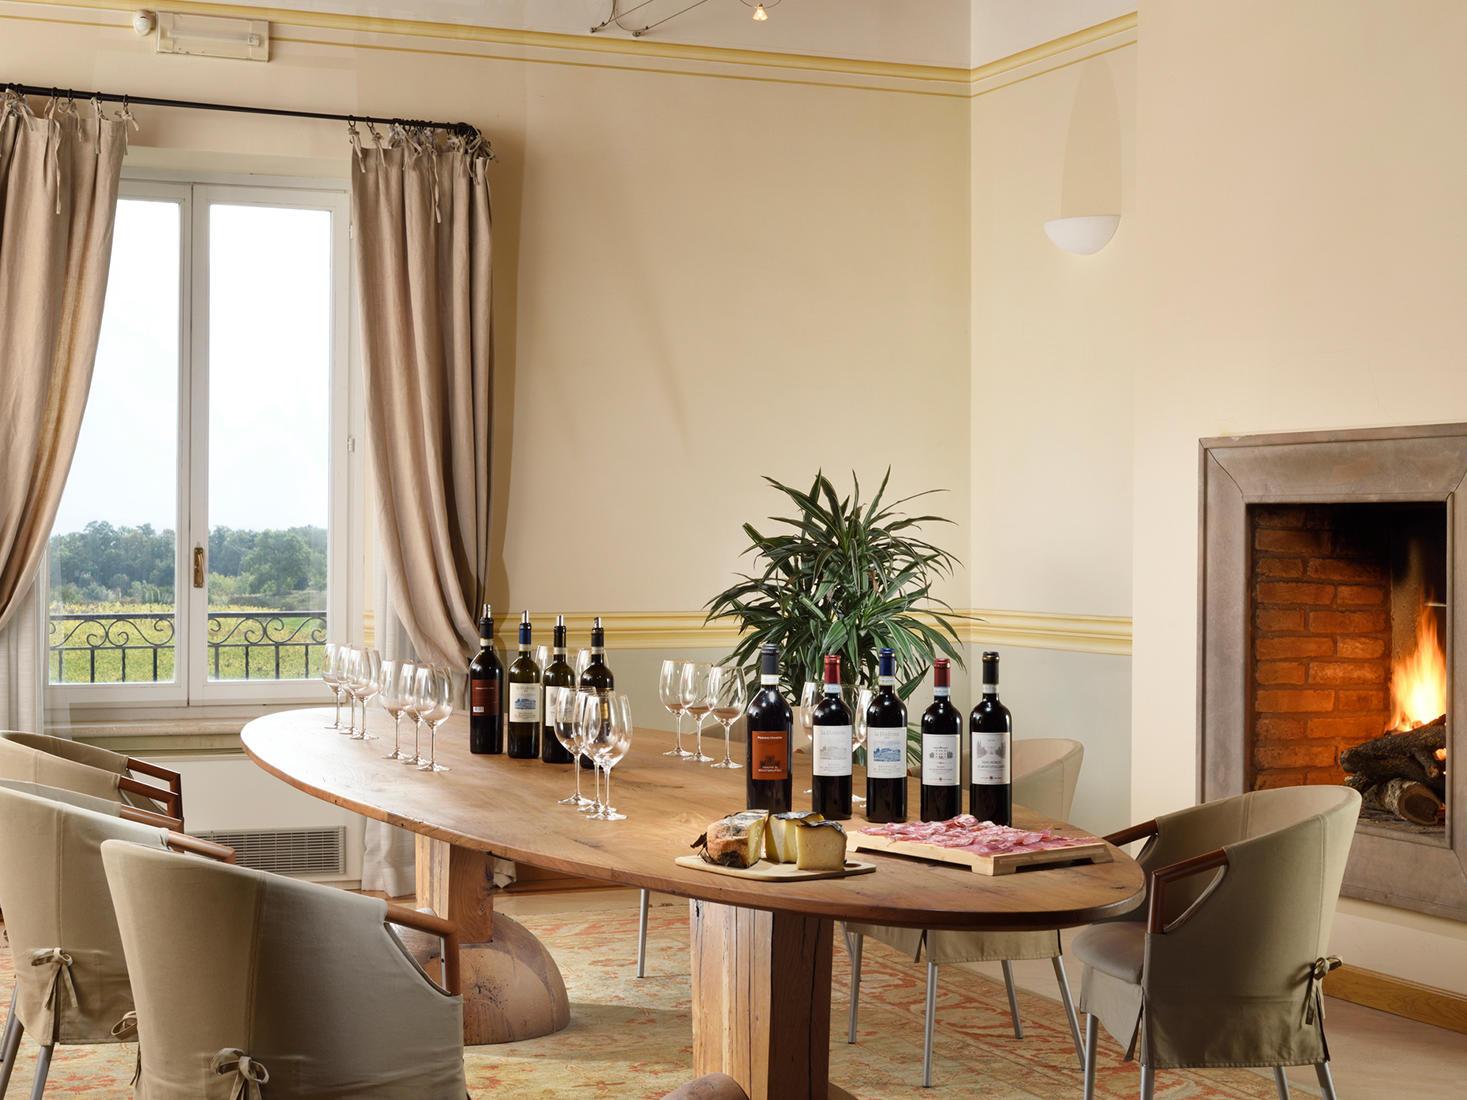 Nobile Meeting Room | Relais Villa Grazianella